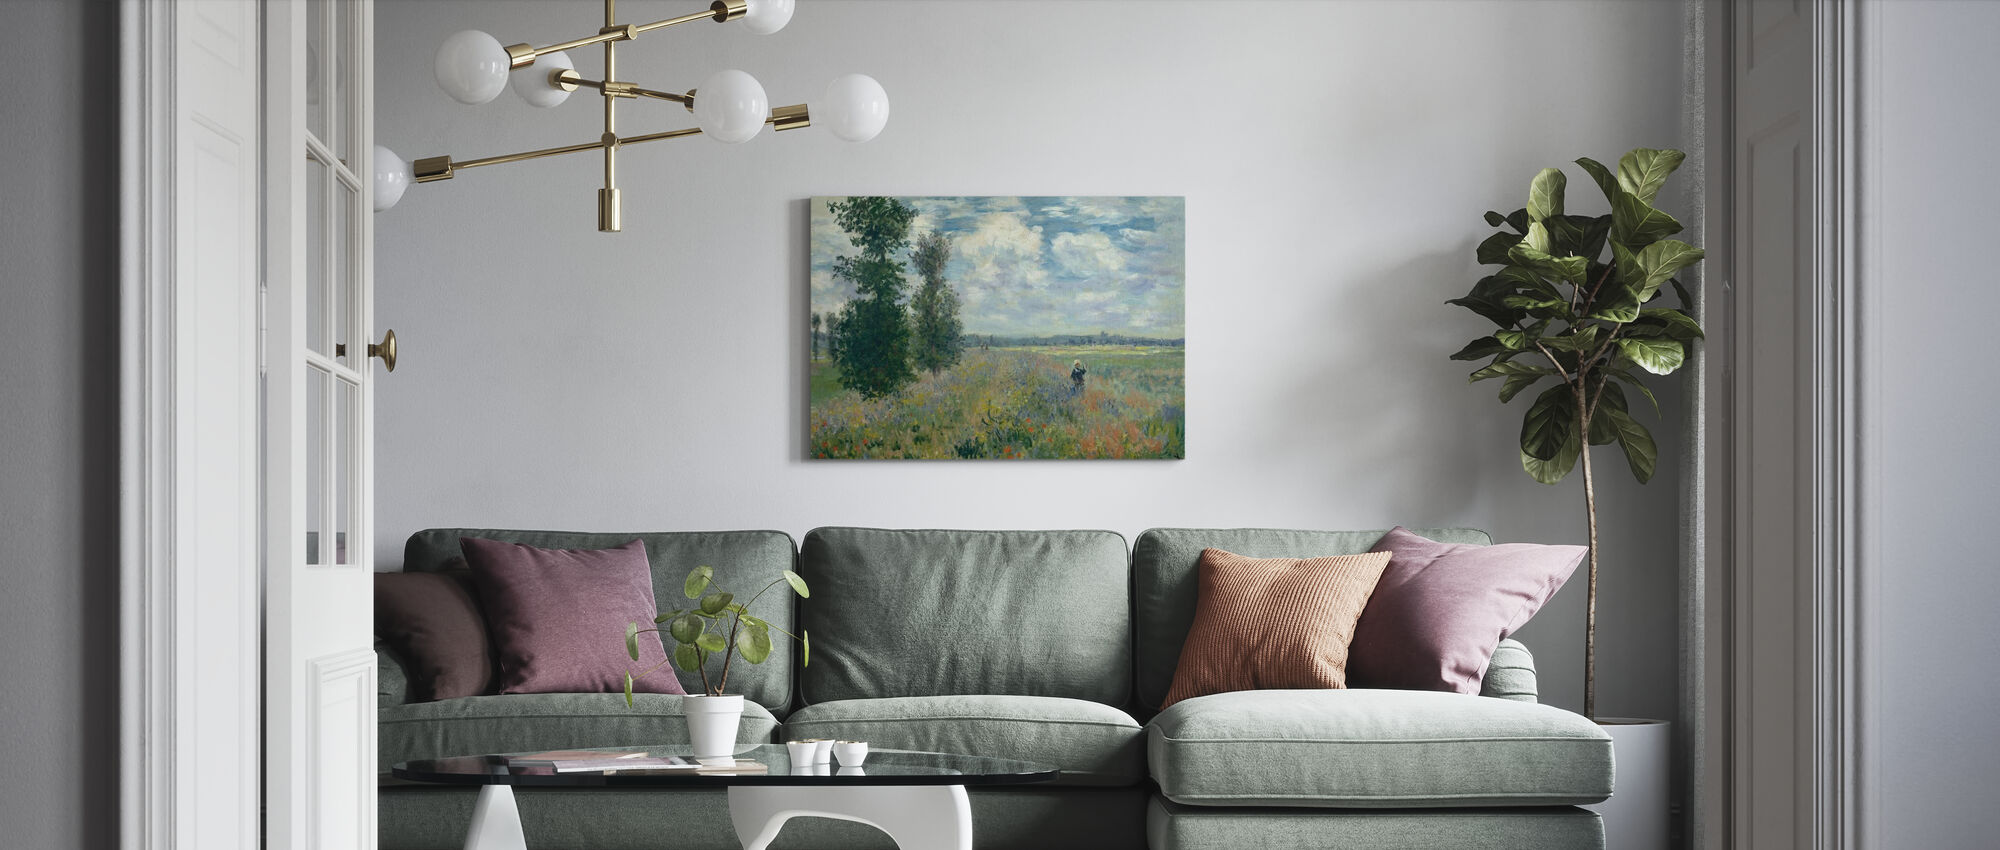 Poppy Fields - Claude Monet - Canvas print - Living Room